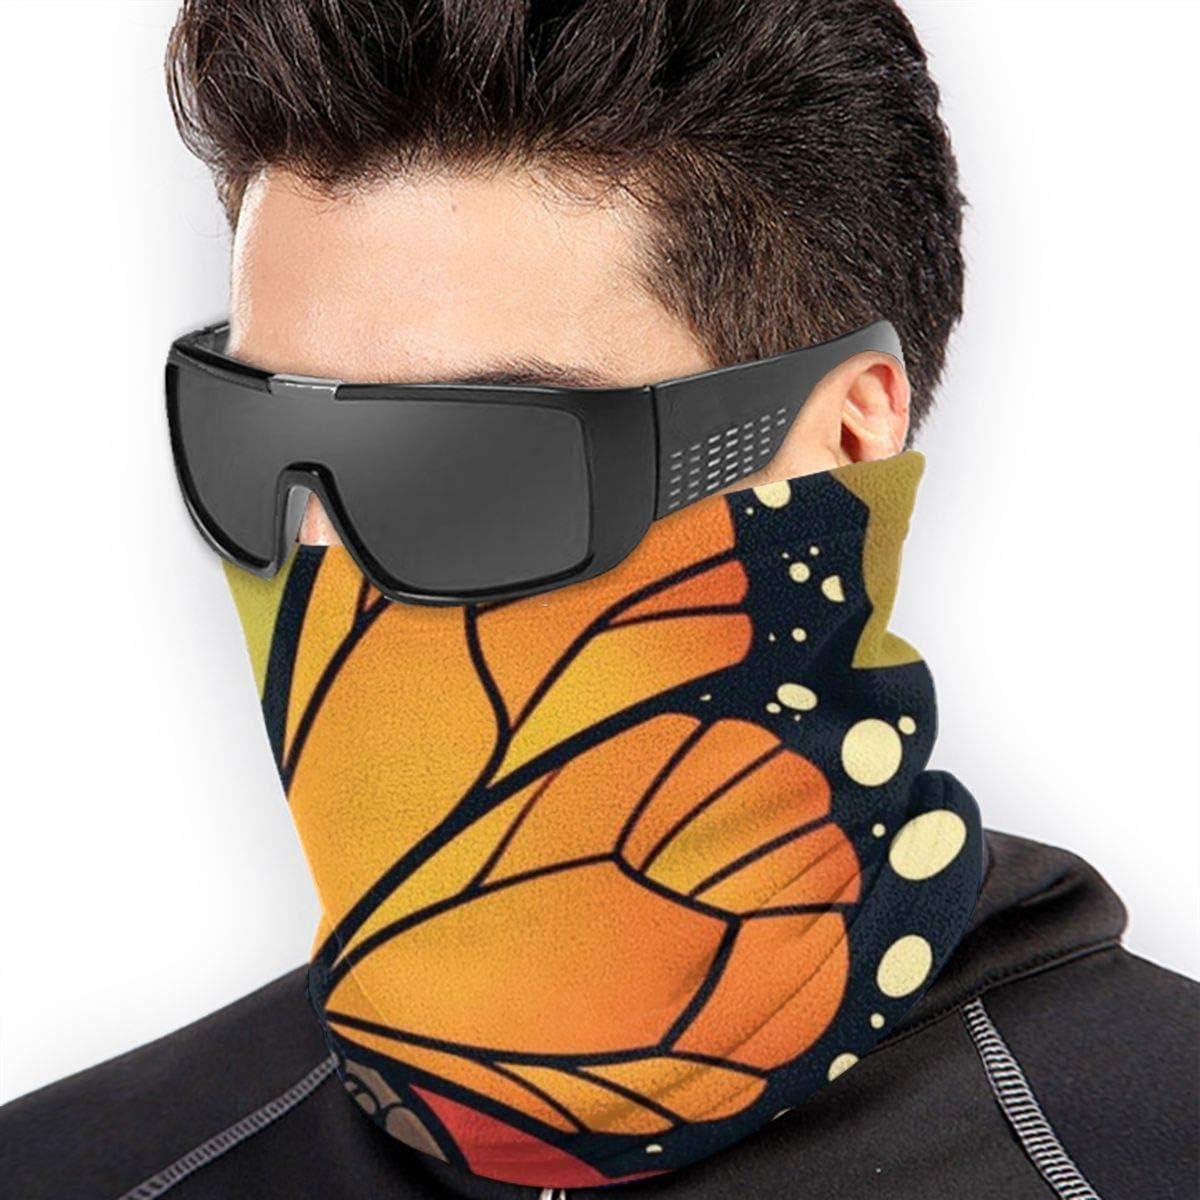 Butternfly and Flower Microfiber Neck Warmer Balaclavas Soft Fleece Headwear Face Scarf Mask for Winter